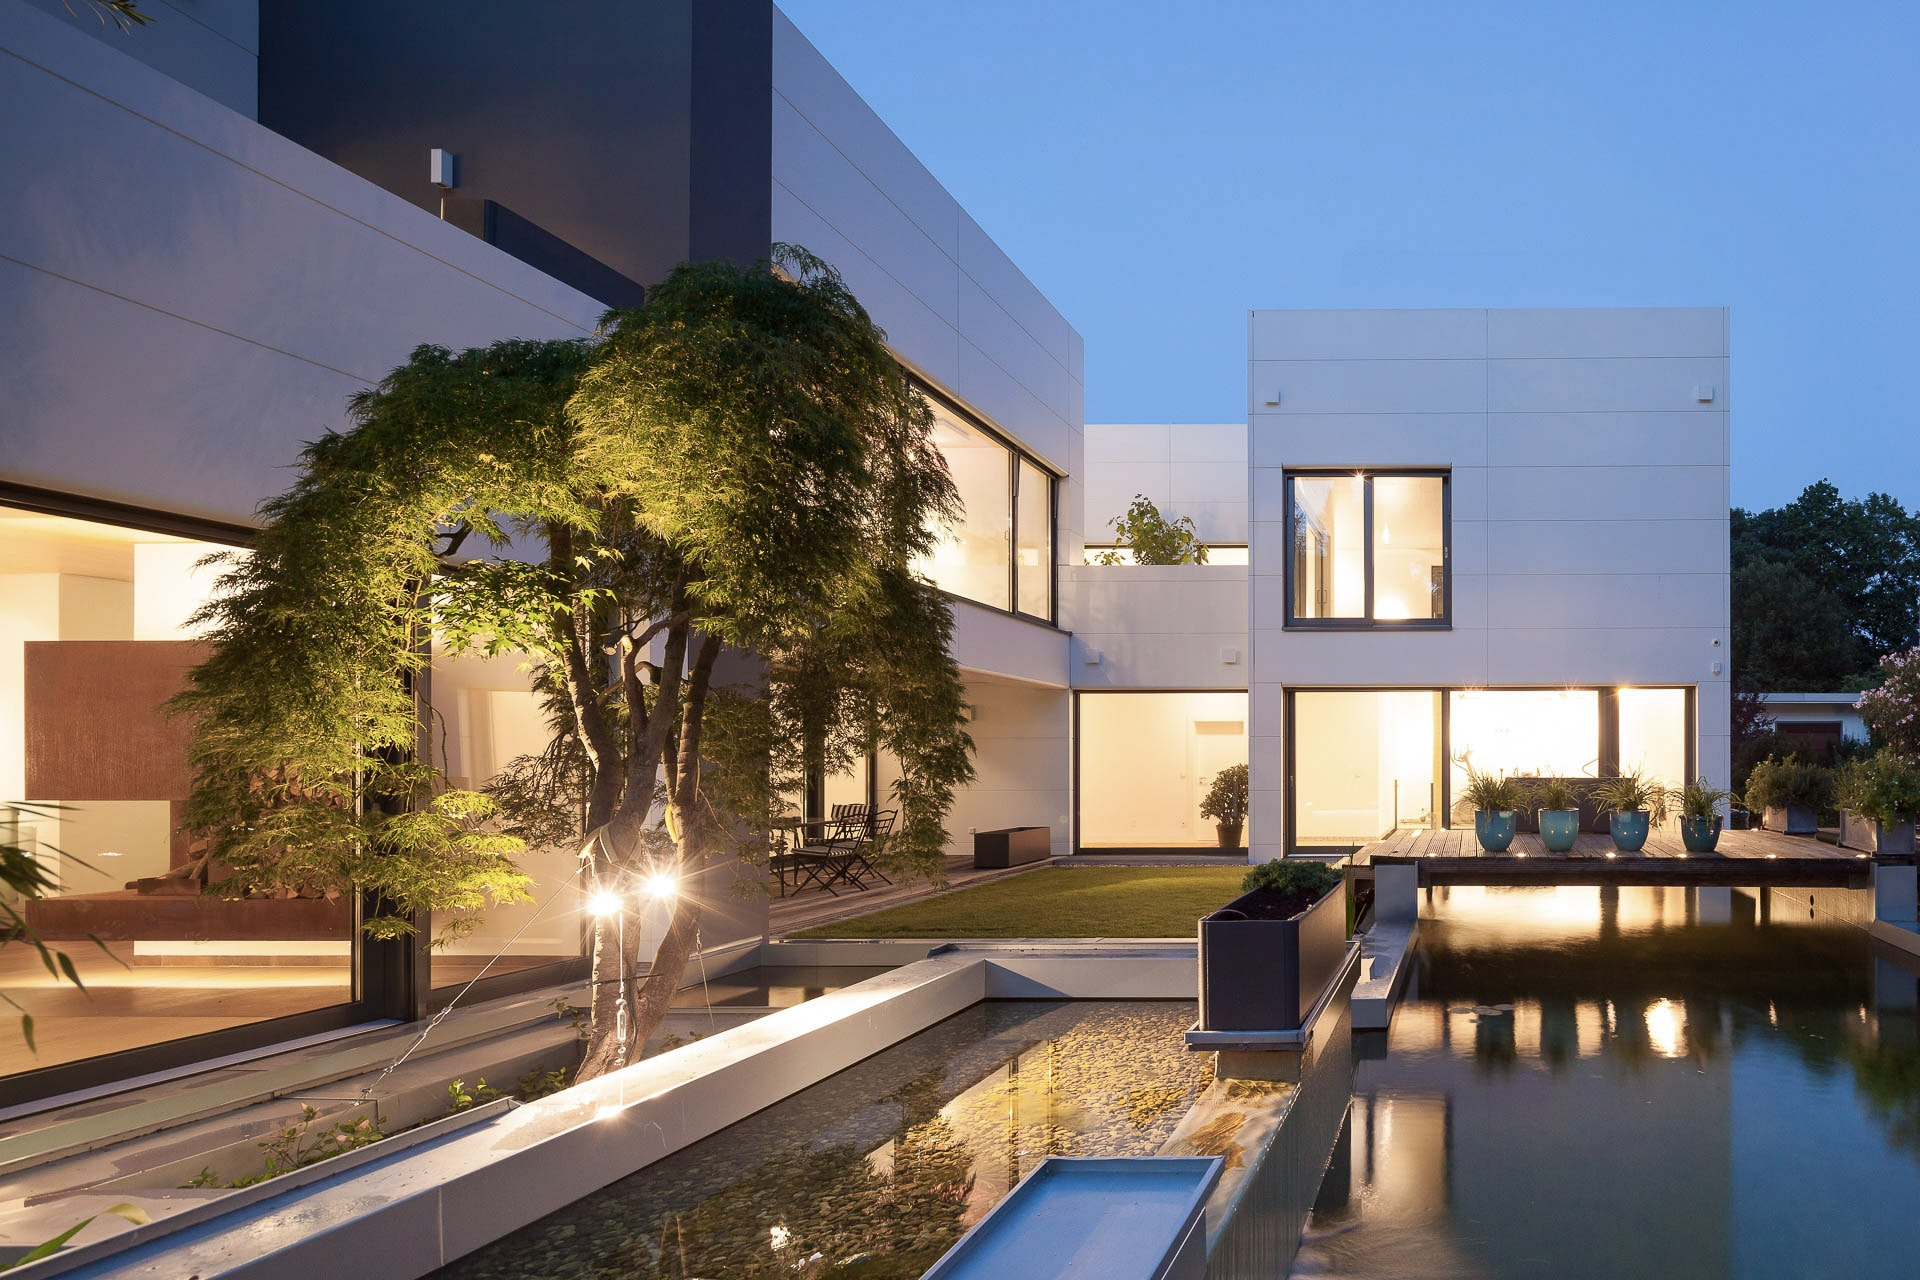 Villa w berlin dirk for Architektenhaus berlin